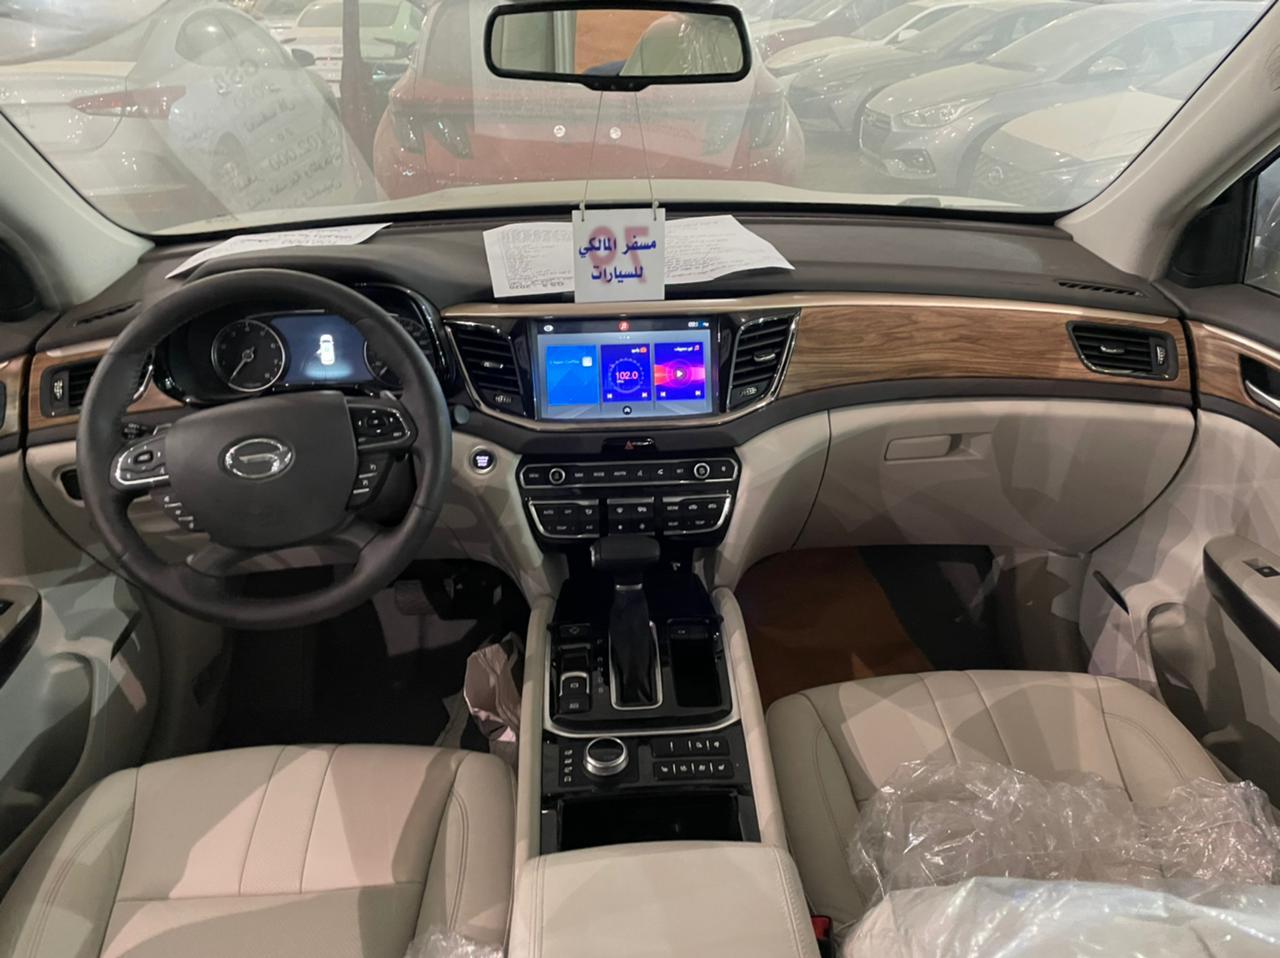 GAC فل  GS8  دبل 2020 سعودي جديد للبيع في جدة - السعودية - صورة كبيرة - 8